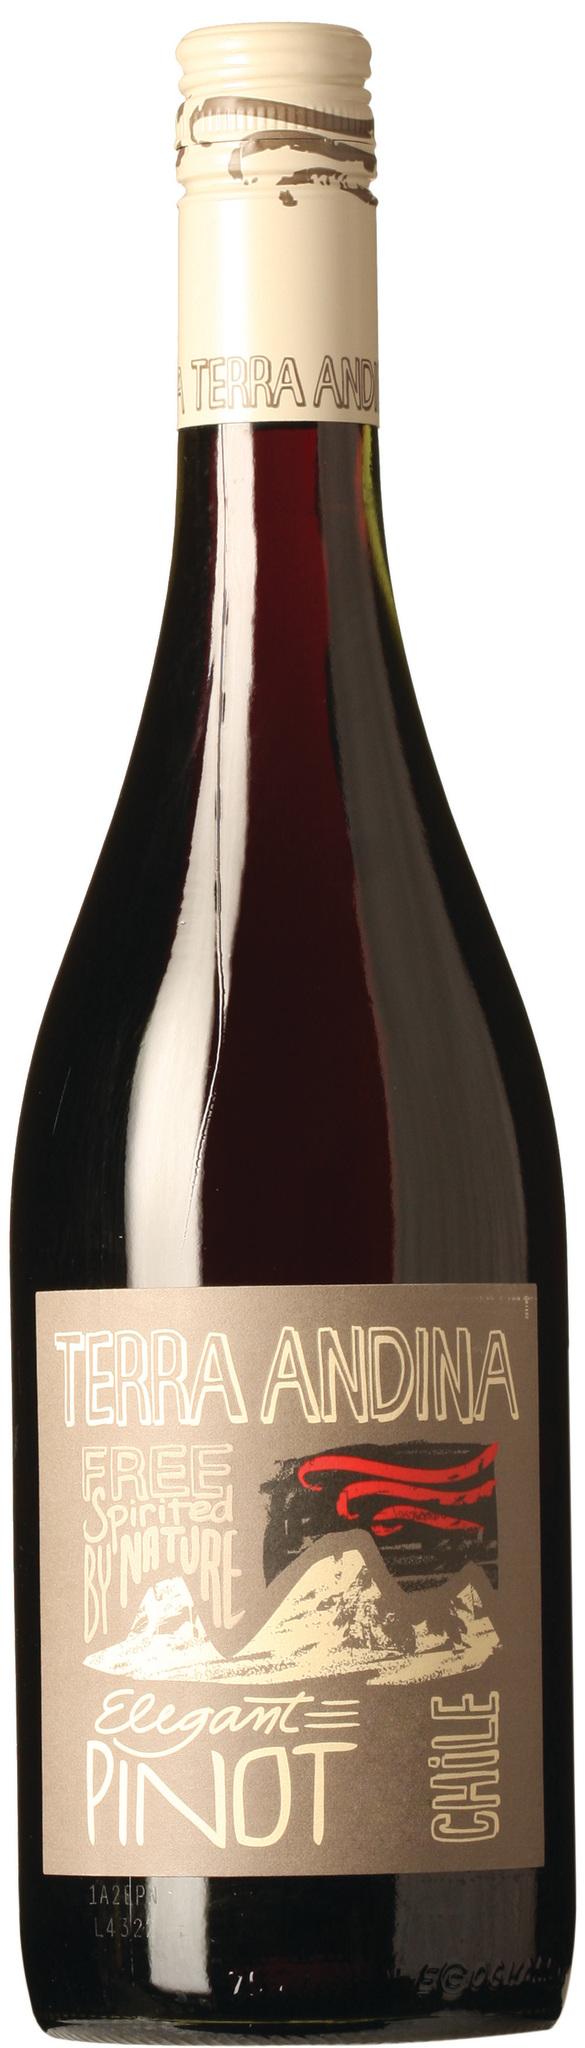 Sur Andino S.A. Elegant Pinot - 13% - CHILENSK RØDVIN - VIN MED MERE .DK